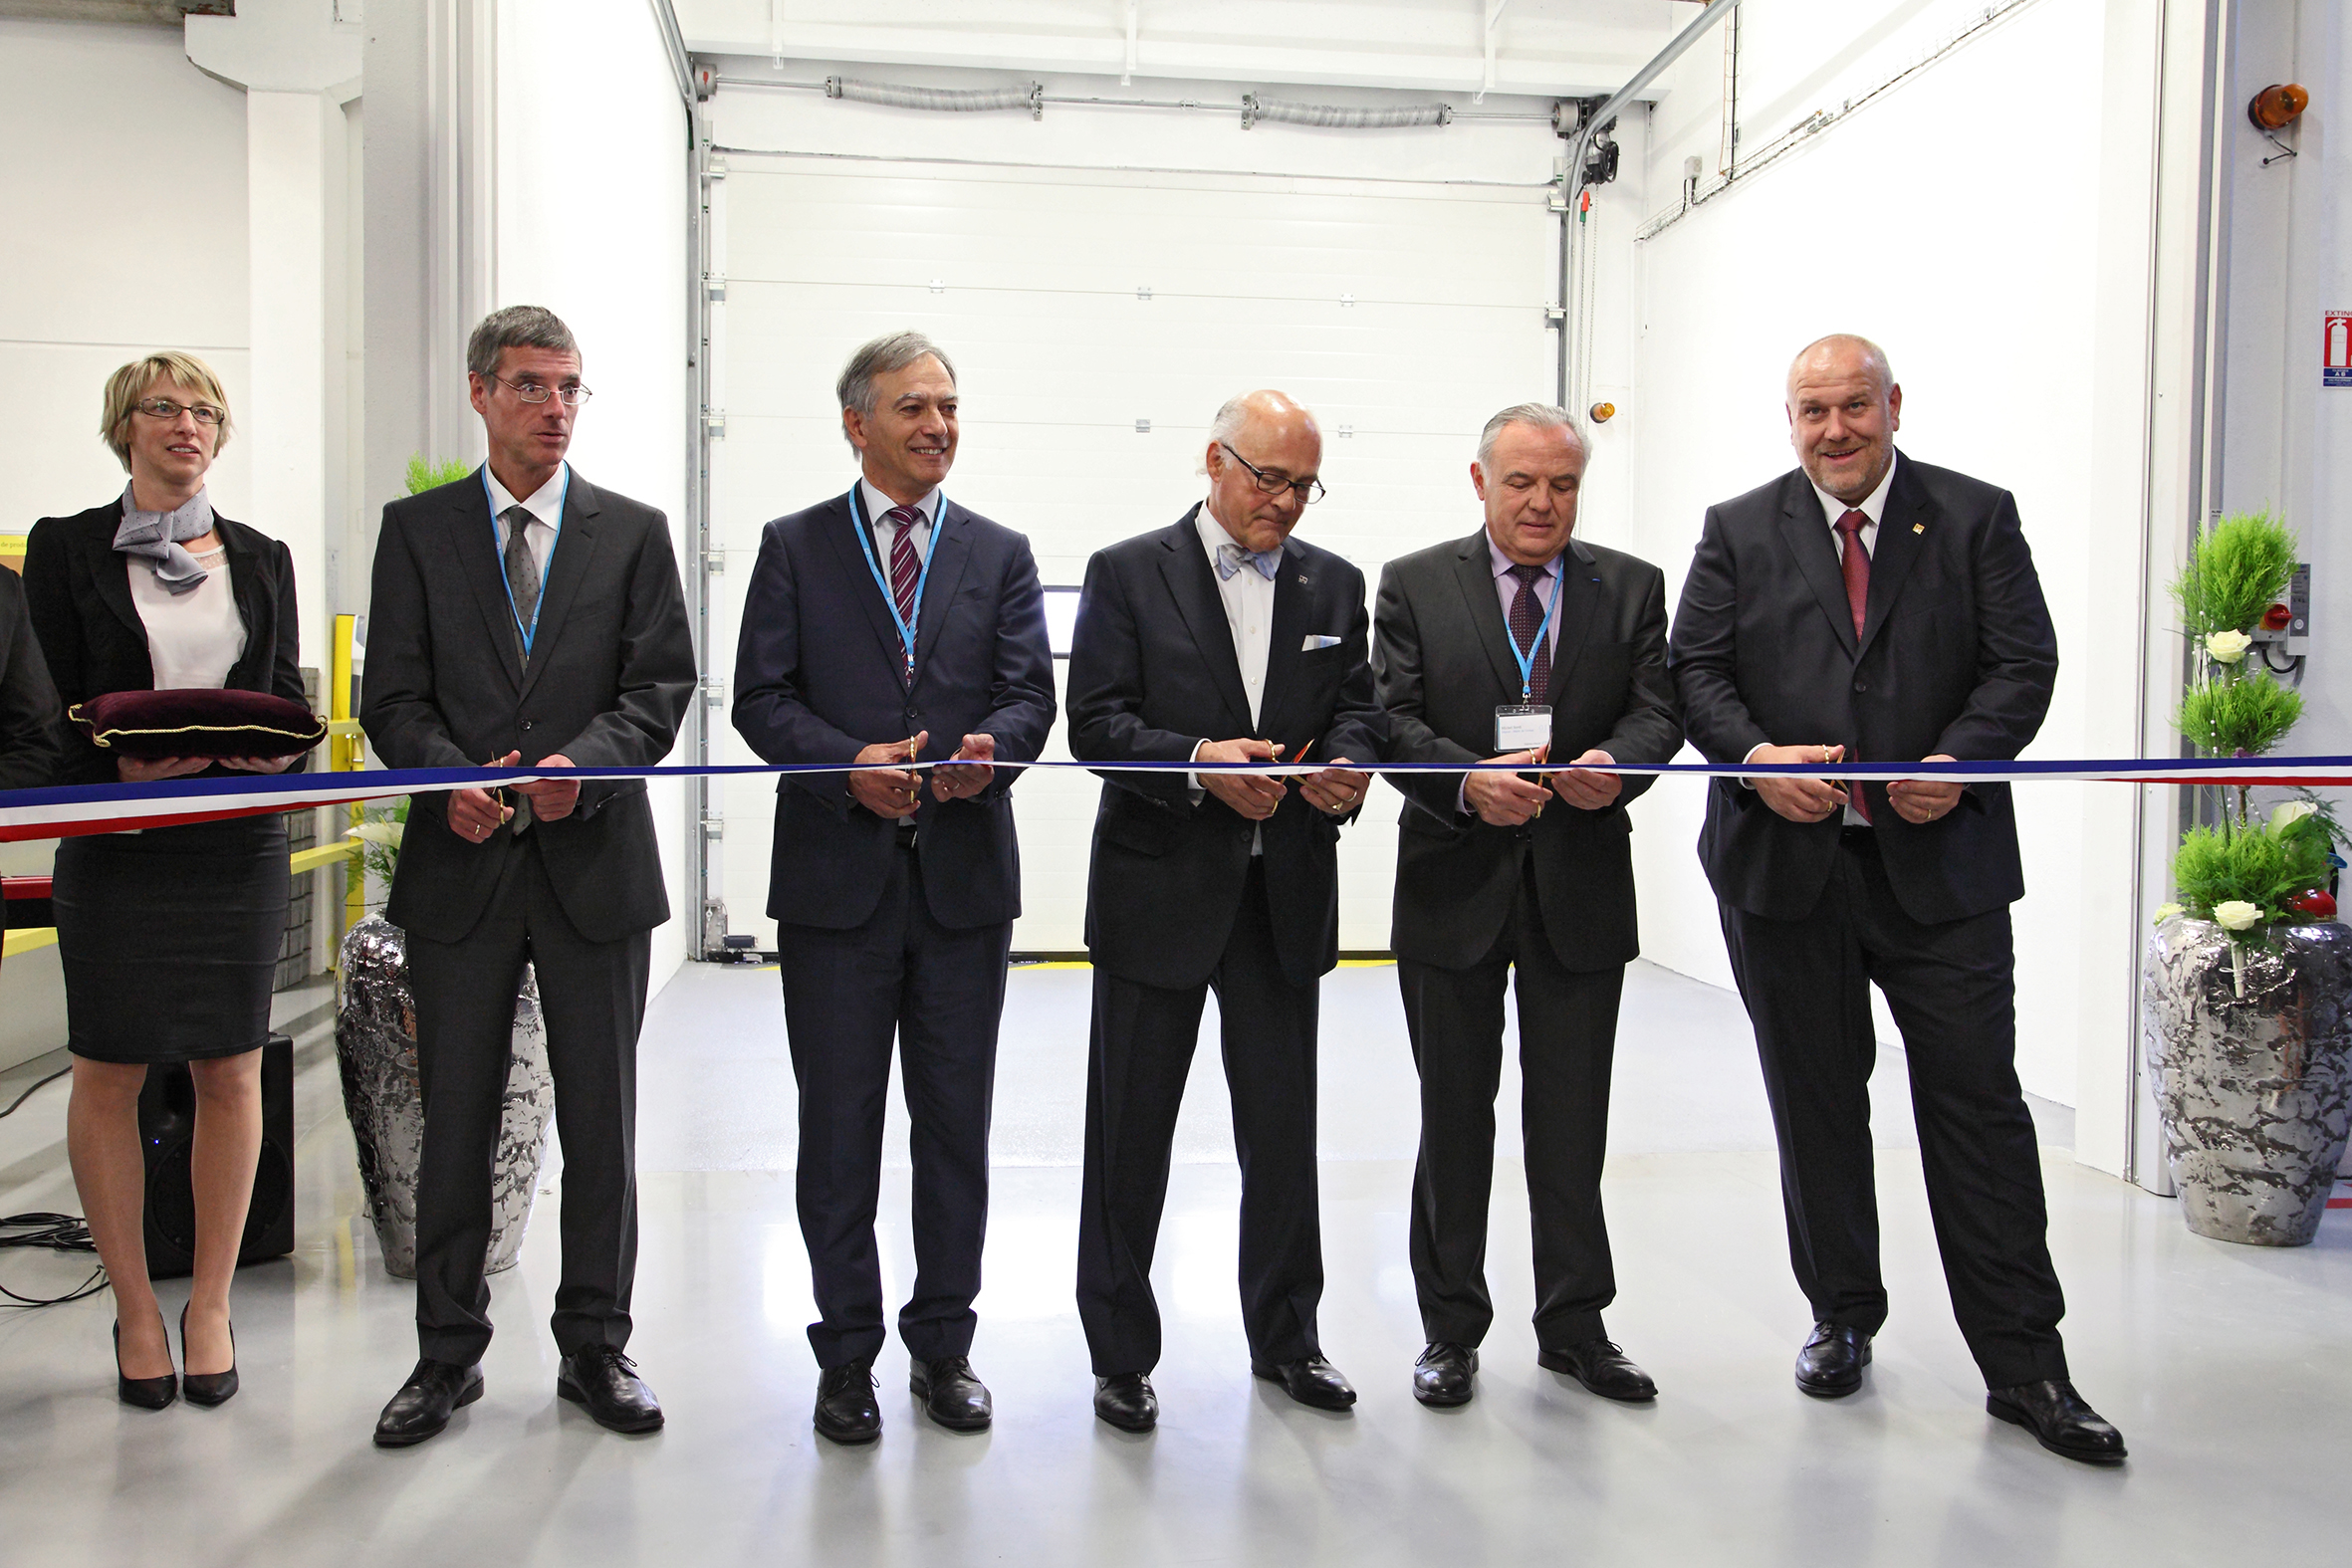 Feierliche Einweihung in Cernay: v.l.n.r. Dr. Bernd-Josef Schäfer (Geschäftsführer Endress+Hauser Flowtec AG), Monsieur Daniel Mérignargues (Sous-Préfet de Thann-Guebwiller), Klaus Endress (Präsident des Verwaltungsrates Endress+Hauser), Michel Sordi (Député-Maire de Cernay) sowie Matthias Altendorf (CEO Endress+Hauser)